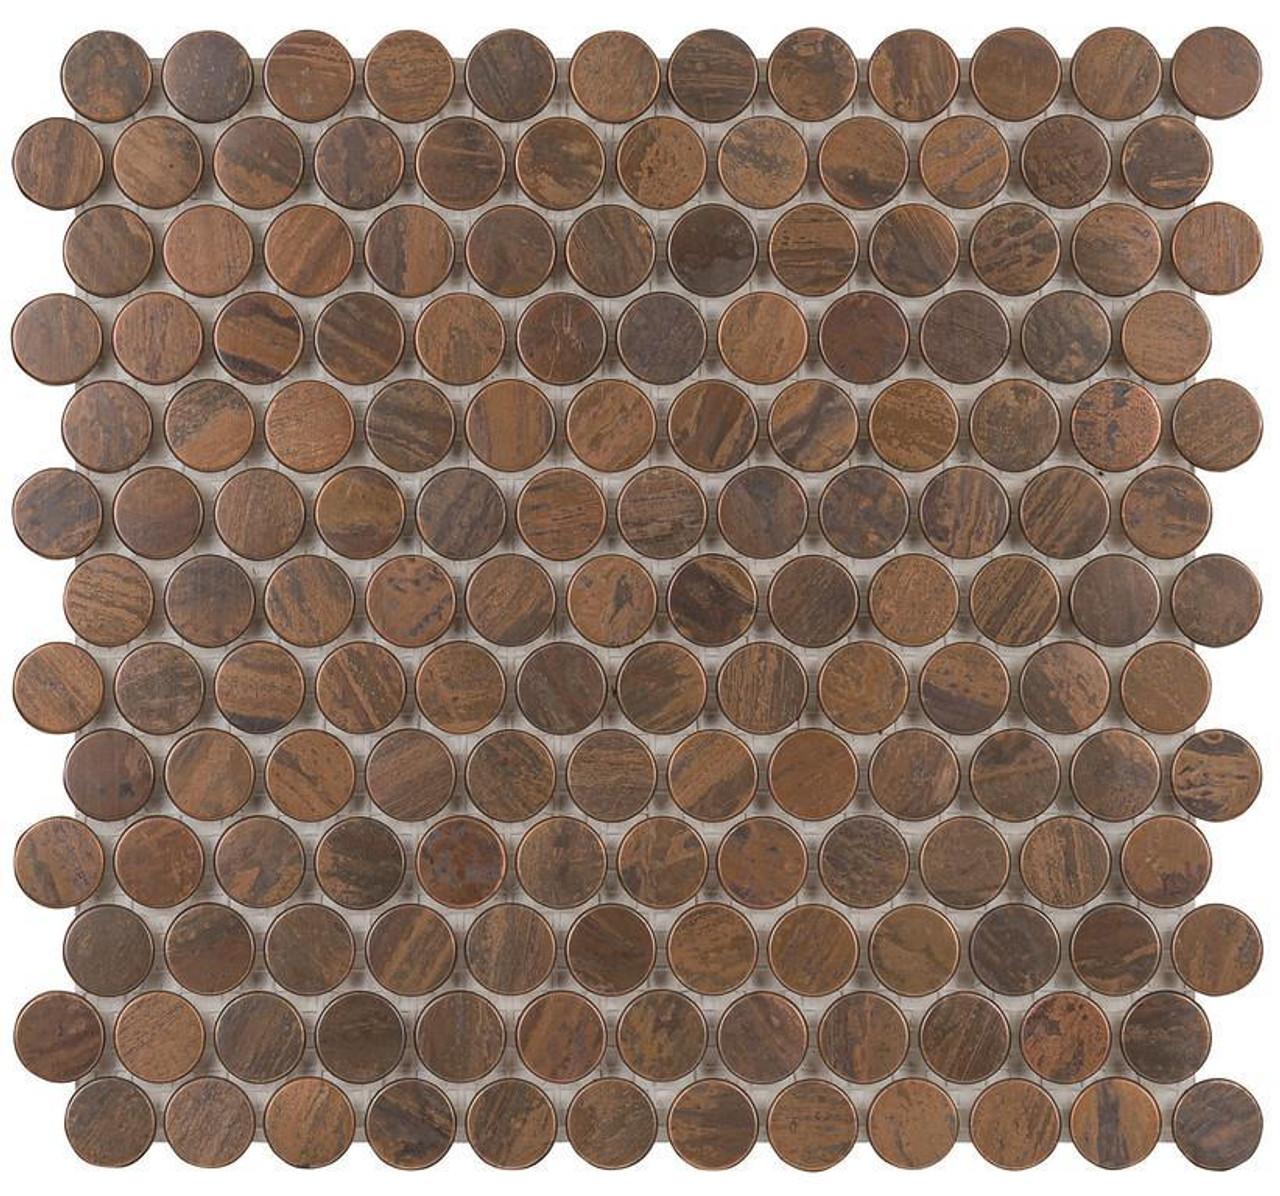 UBC Antique Copper Tile Backsplash Nickels Mosaic